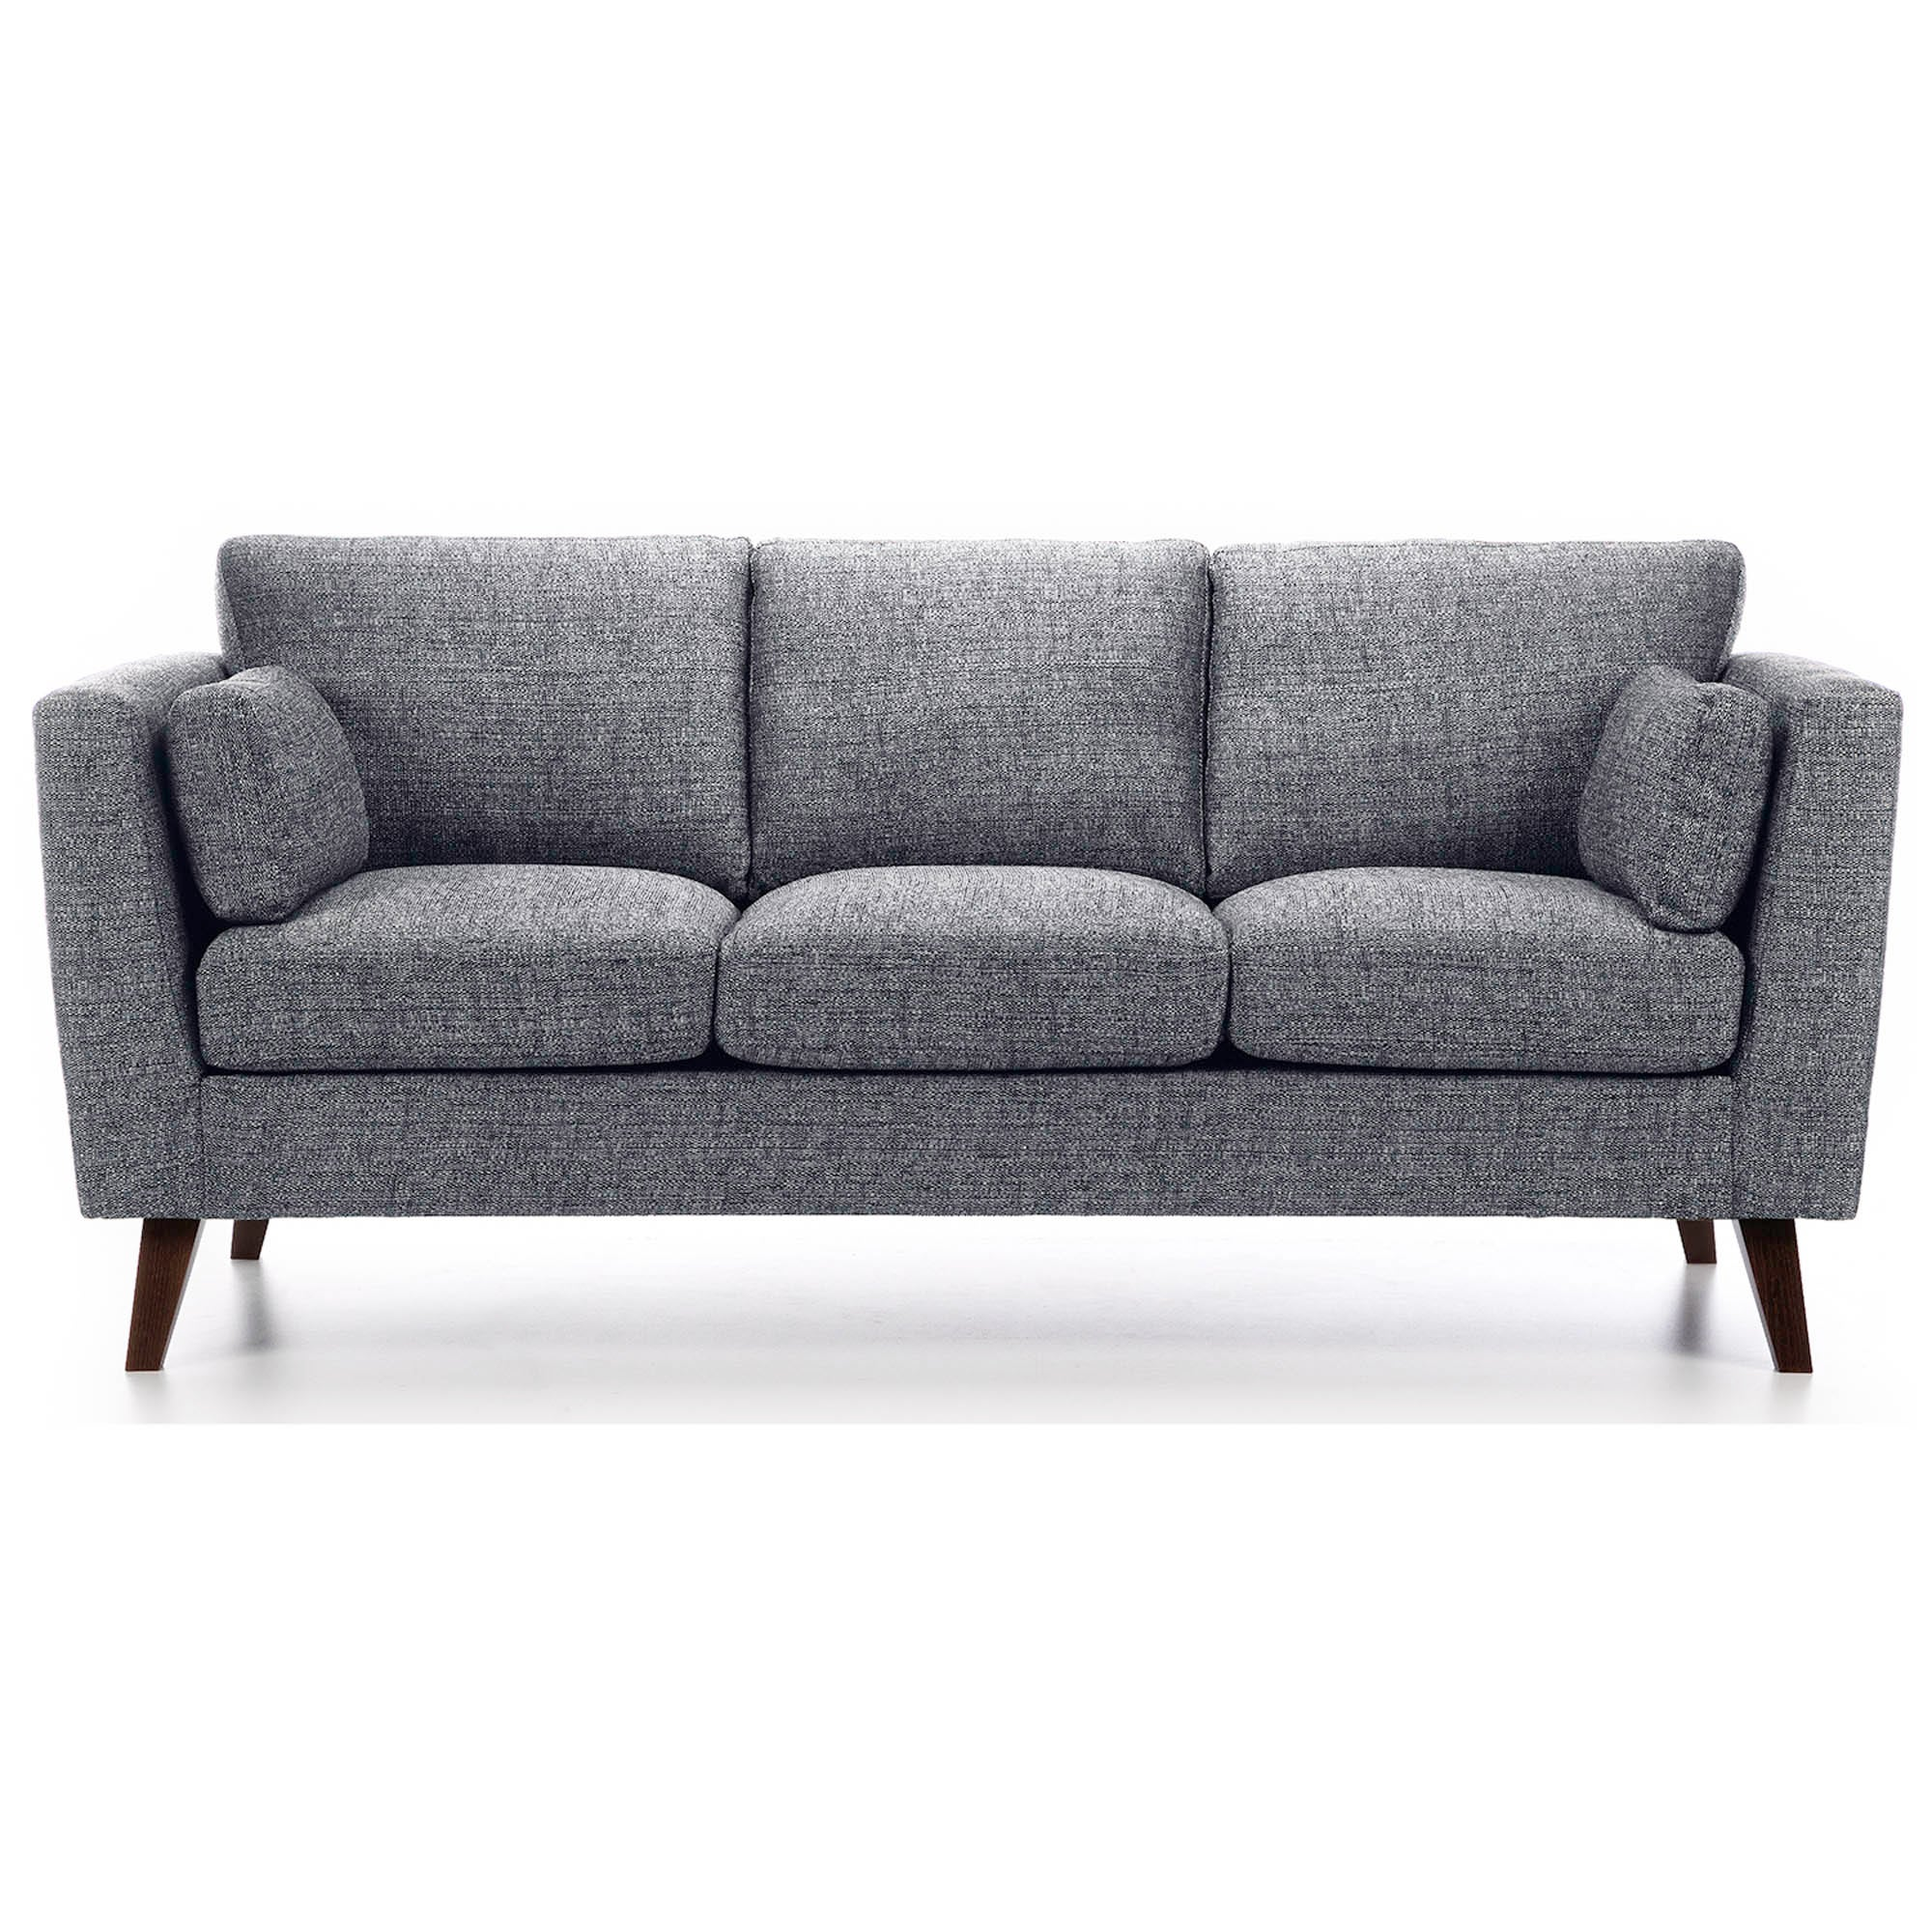 SofasWorld Collection Sam Fabric 3 Seater Sofa Black